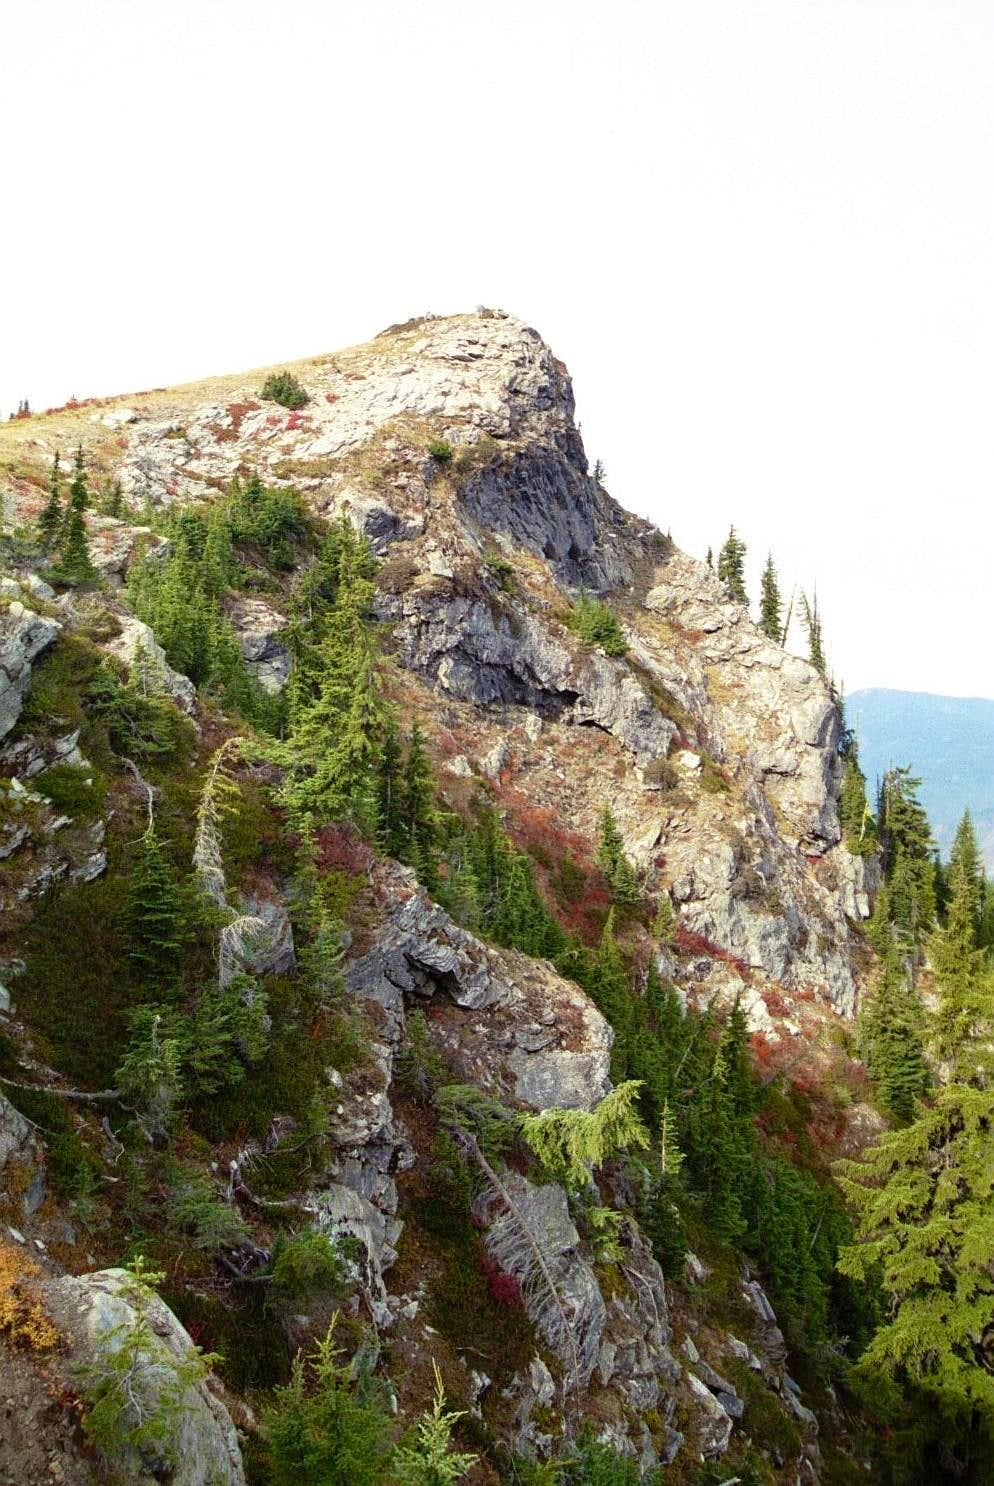 North Face of Larkins Peak